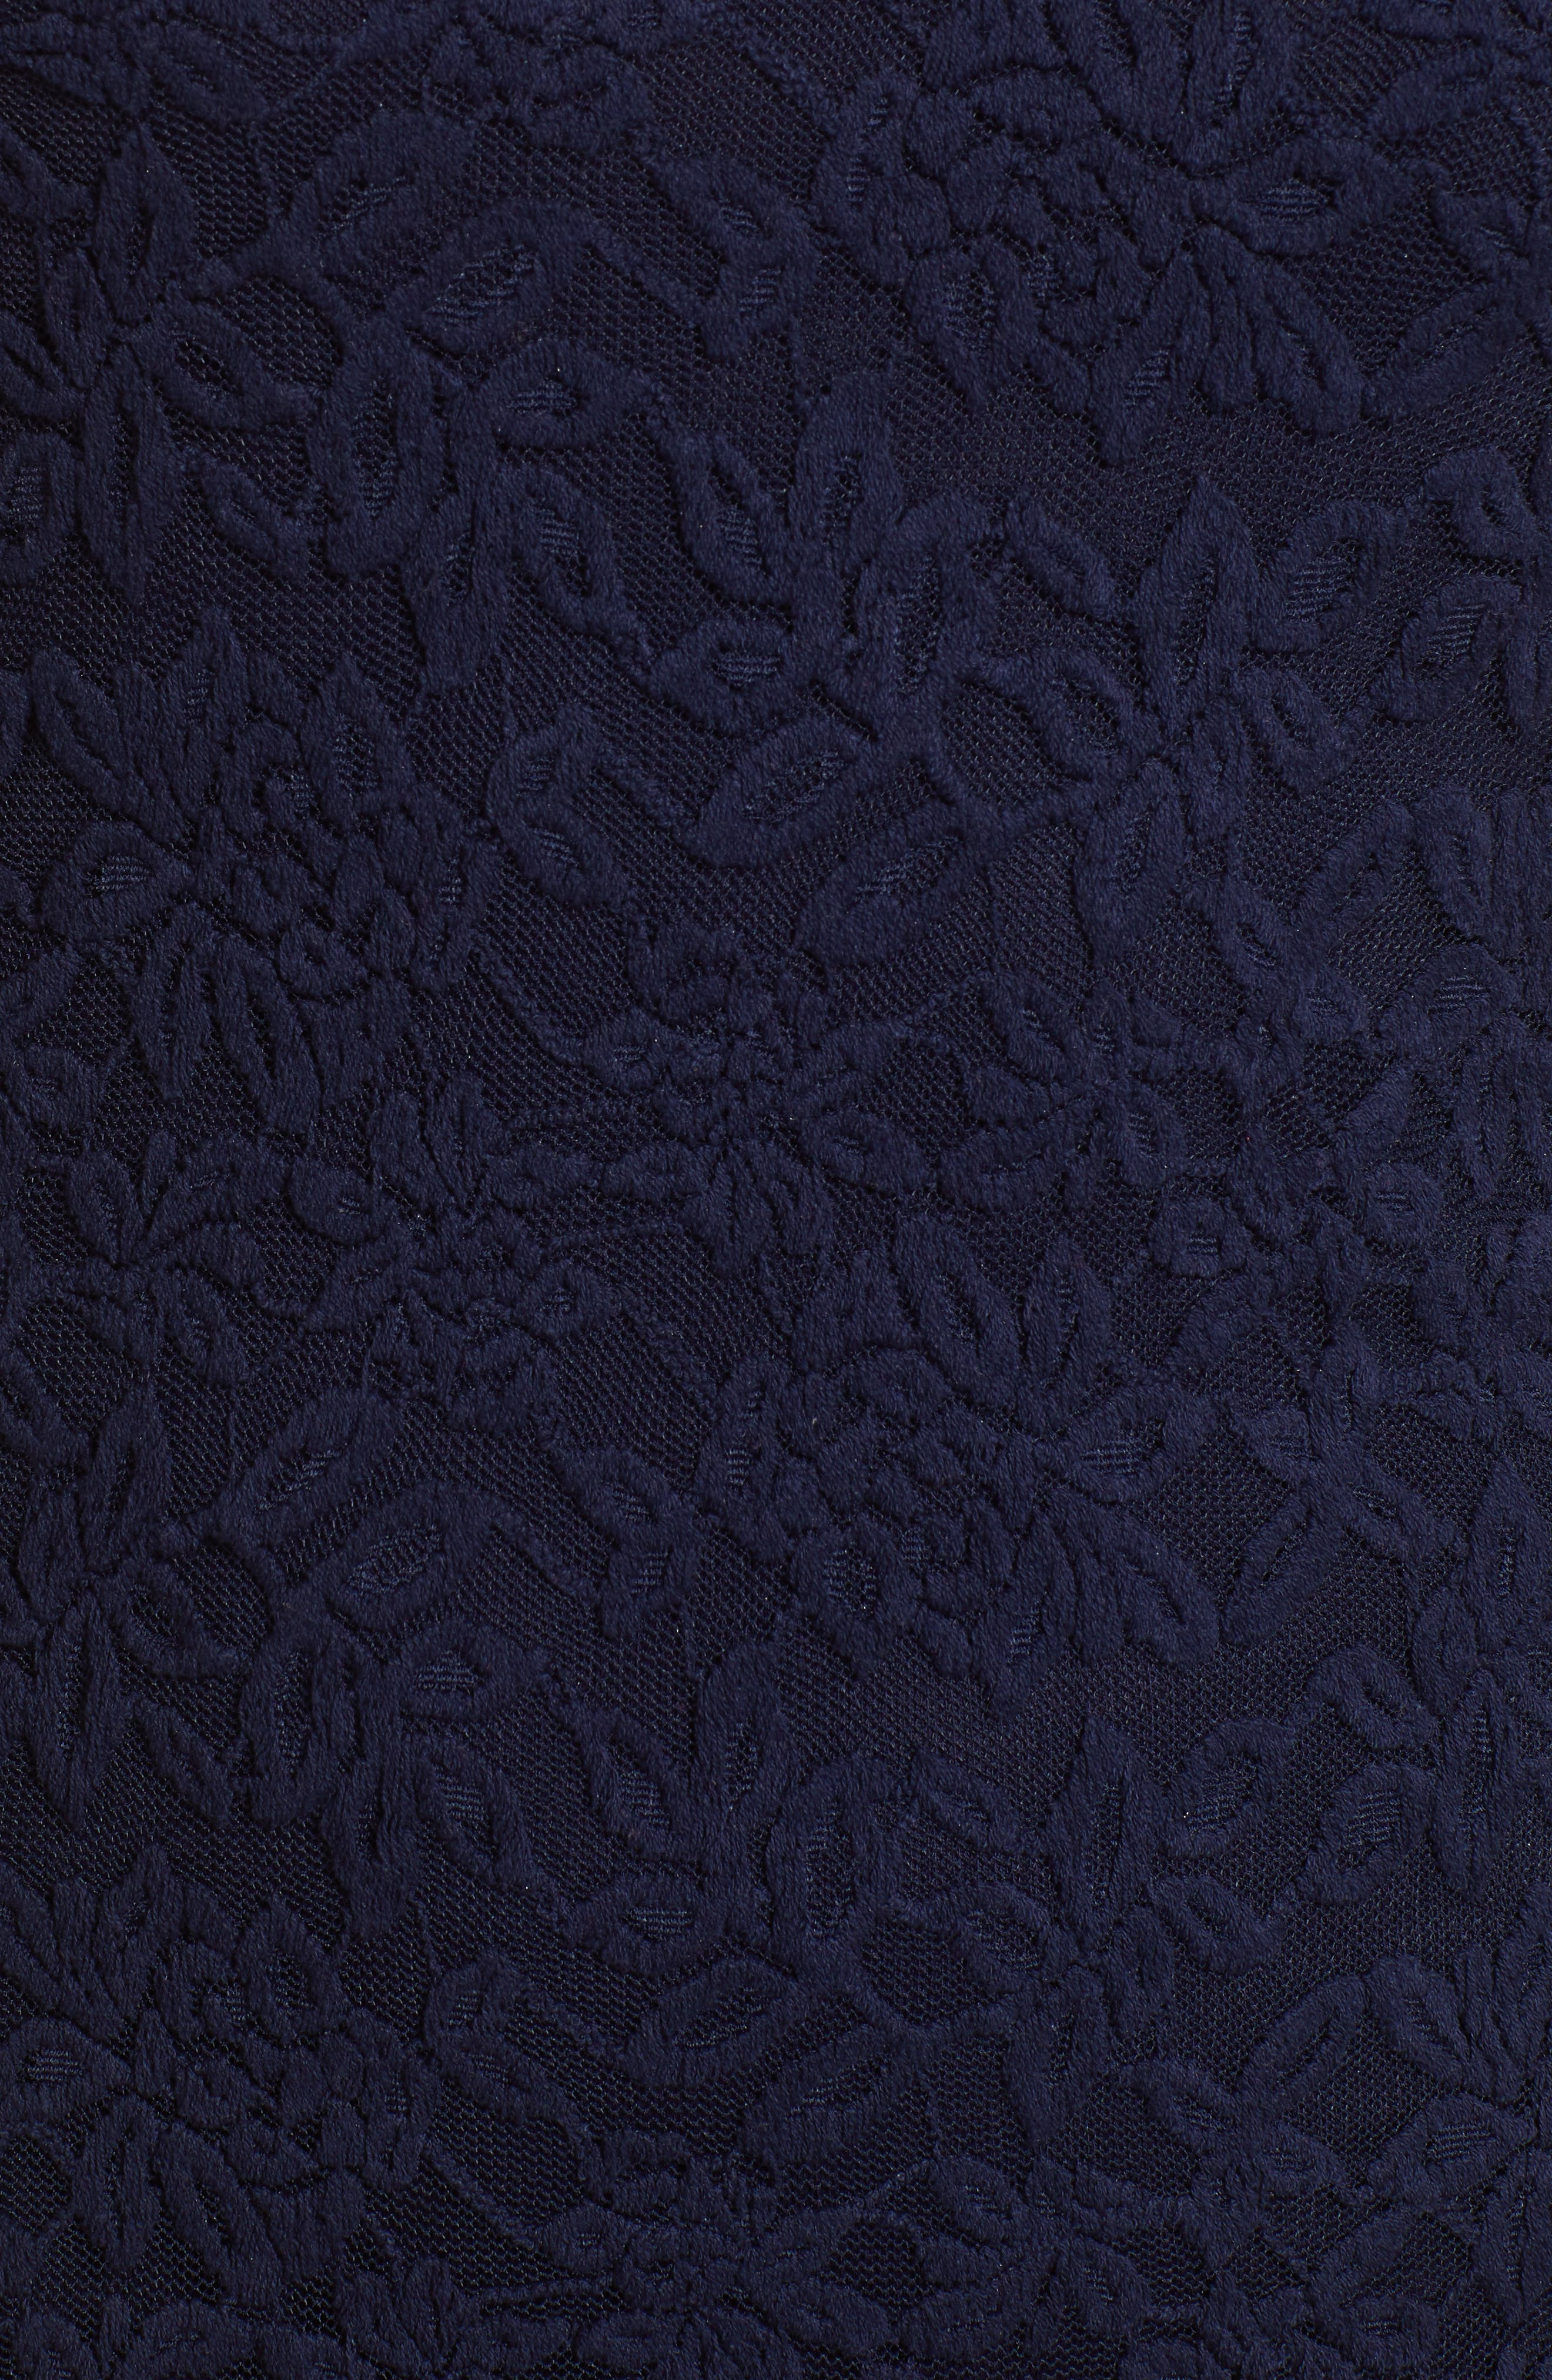 ROSEMUNDE, Delicia Lace Body-Con Dress, Alternate thumbnail 6, color, MARITIME BLUE